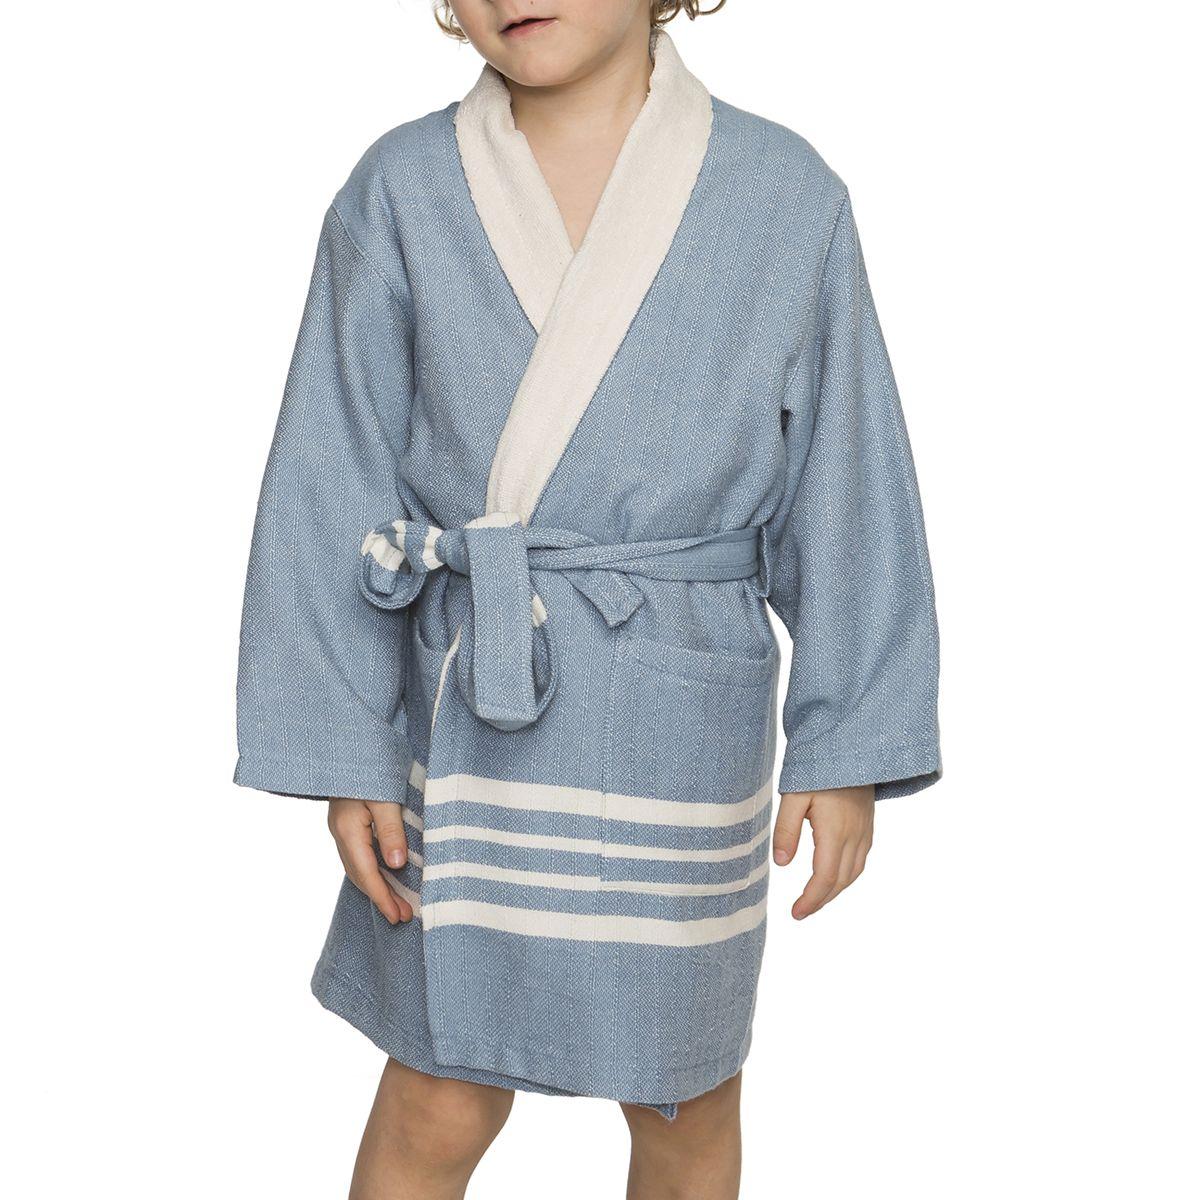 fd4a4c3b3407a KID   CHILD BATHROBE KREM SULTAN WITH NATURAL THIN TERRY LINING - AIR BLUE  Why not